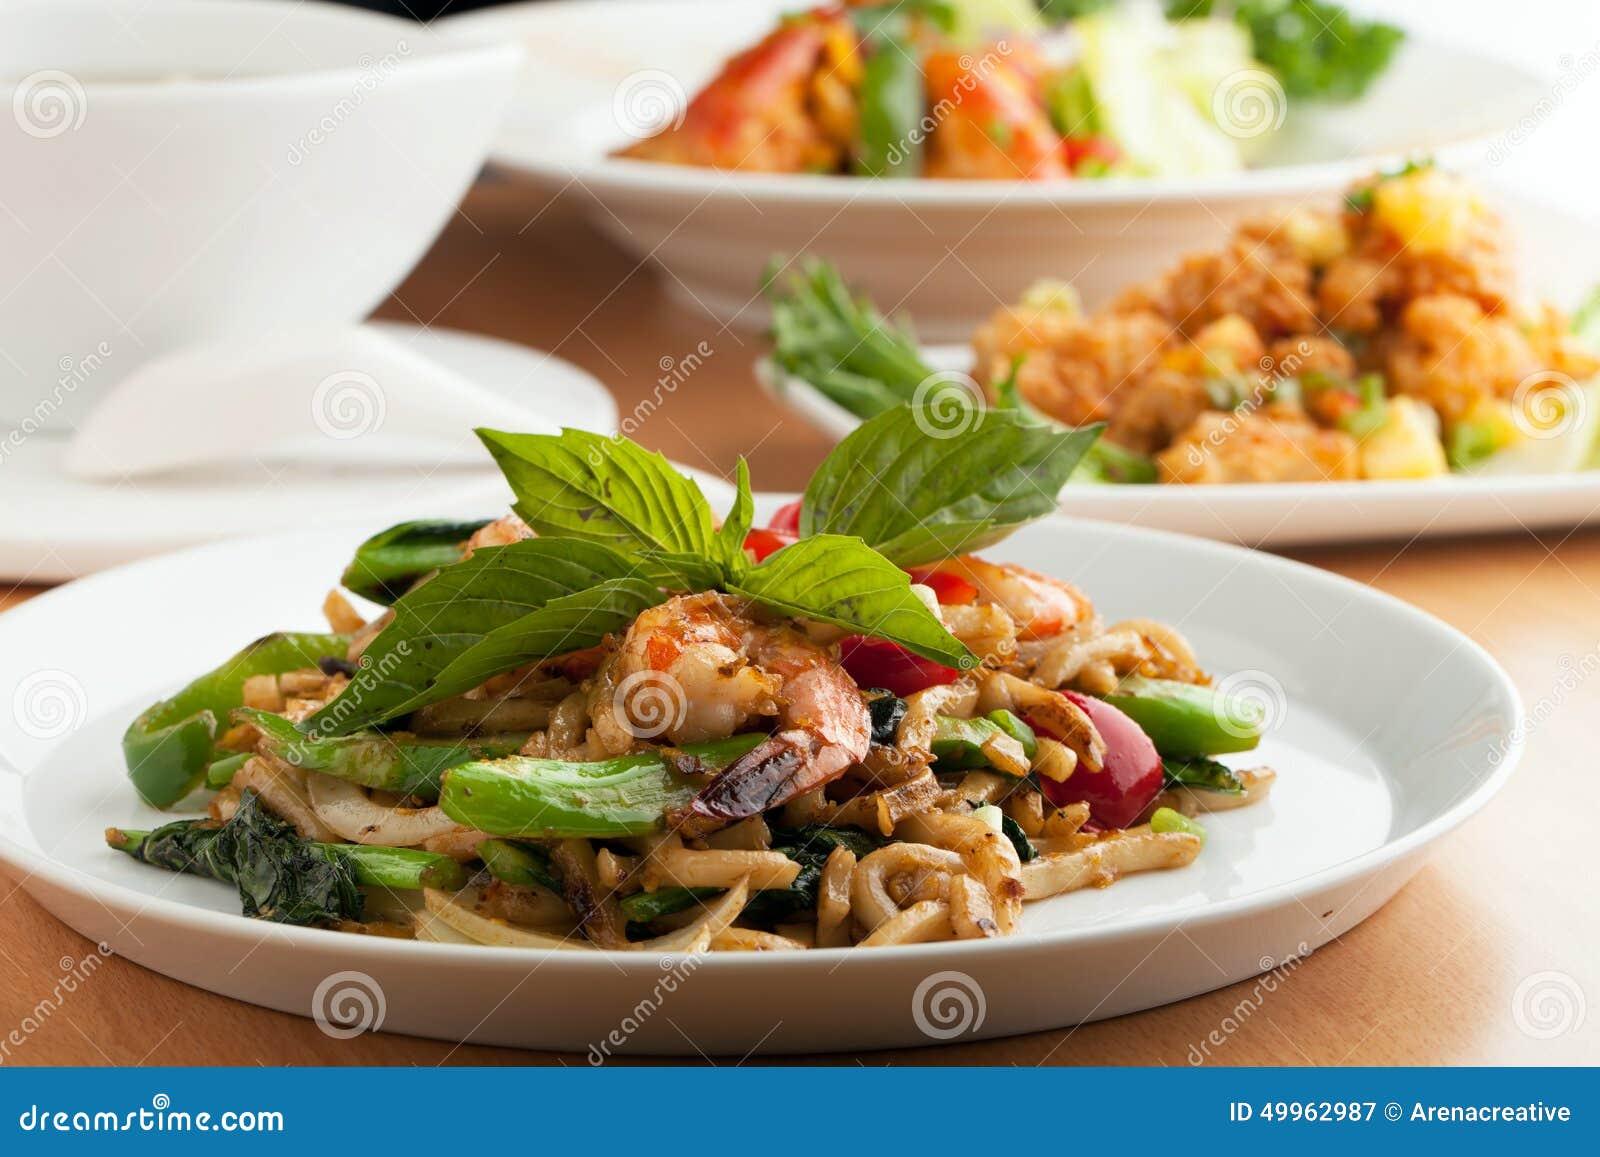 Variety of thai food